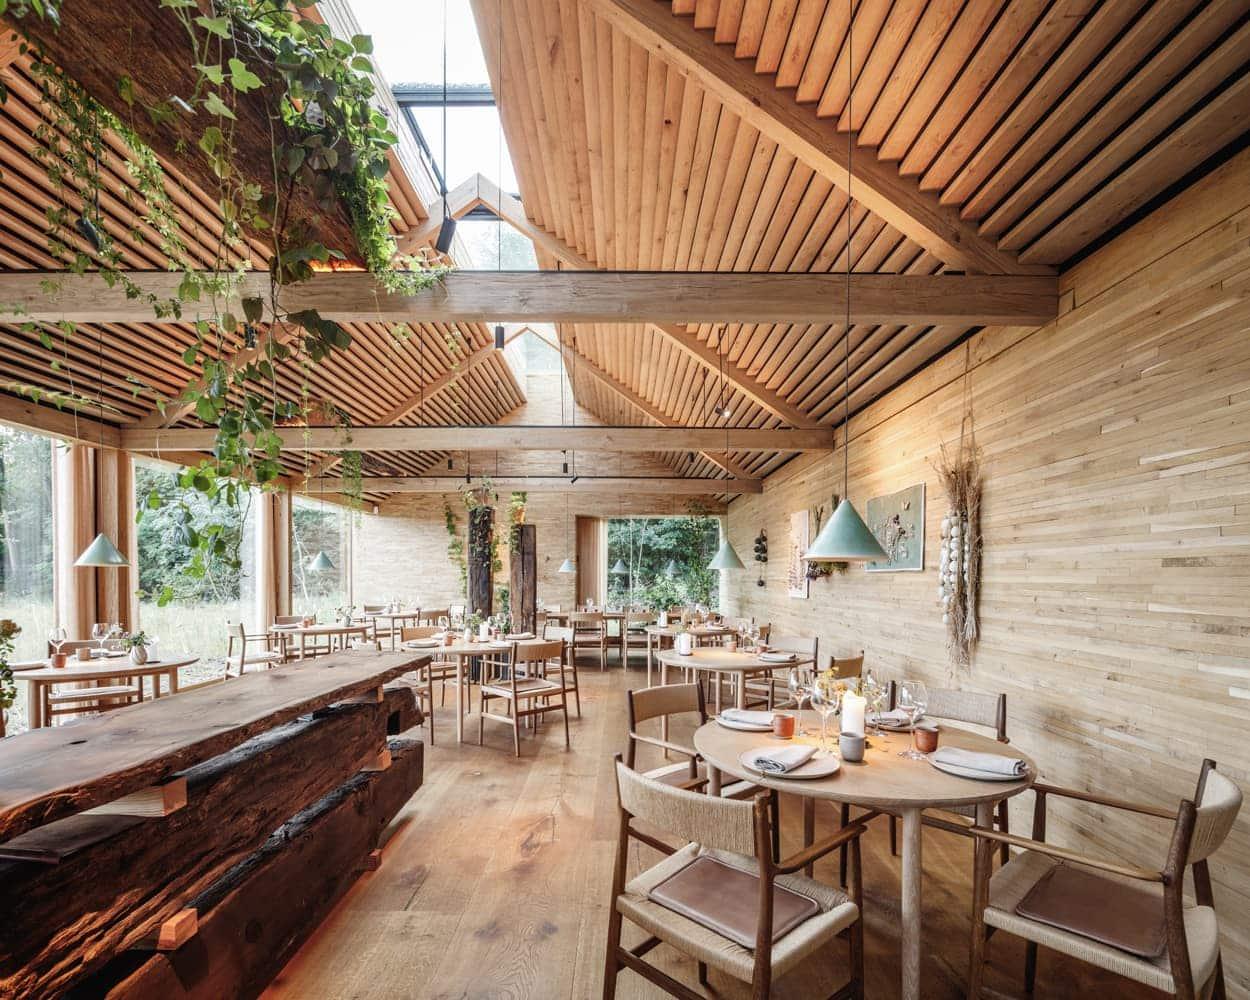 restaurante-noma-copenhague-mejor-restaurante-del-mundo-4